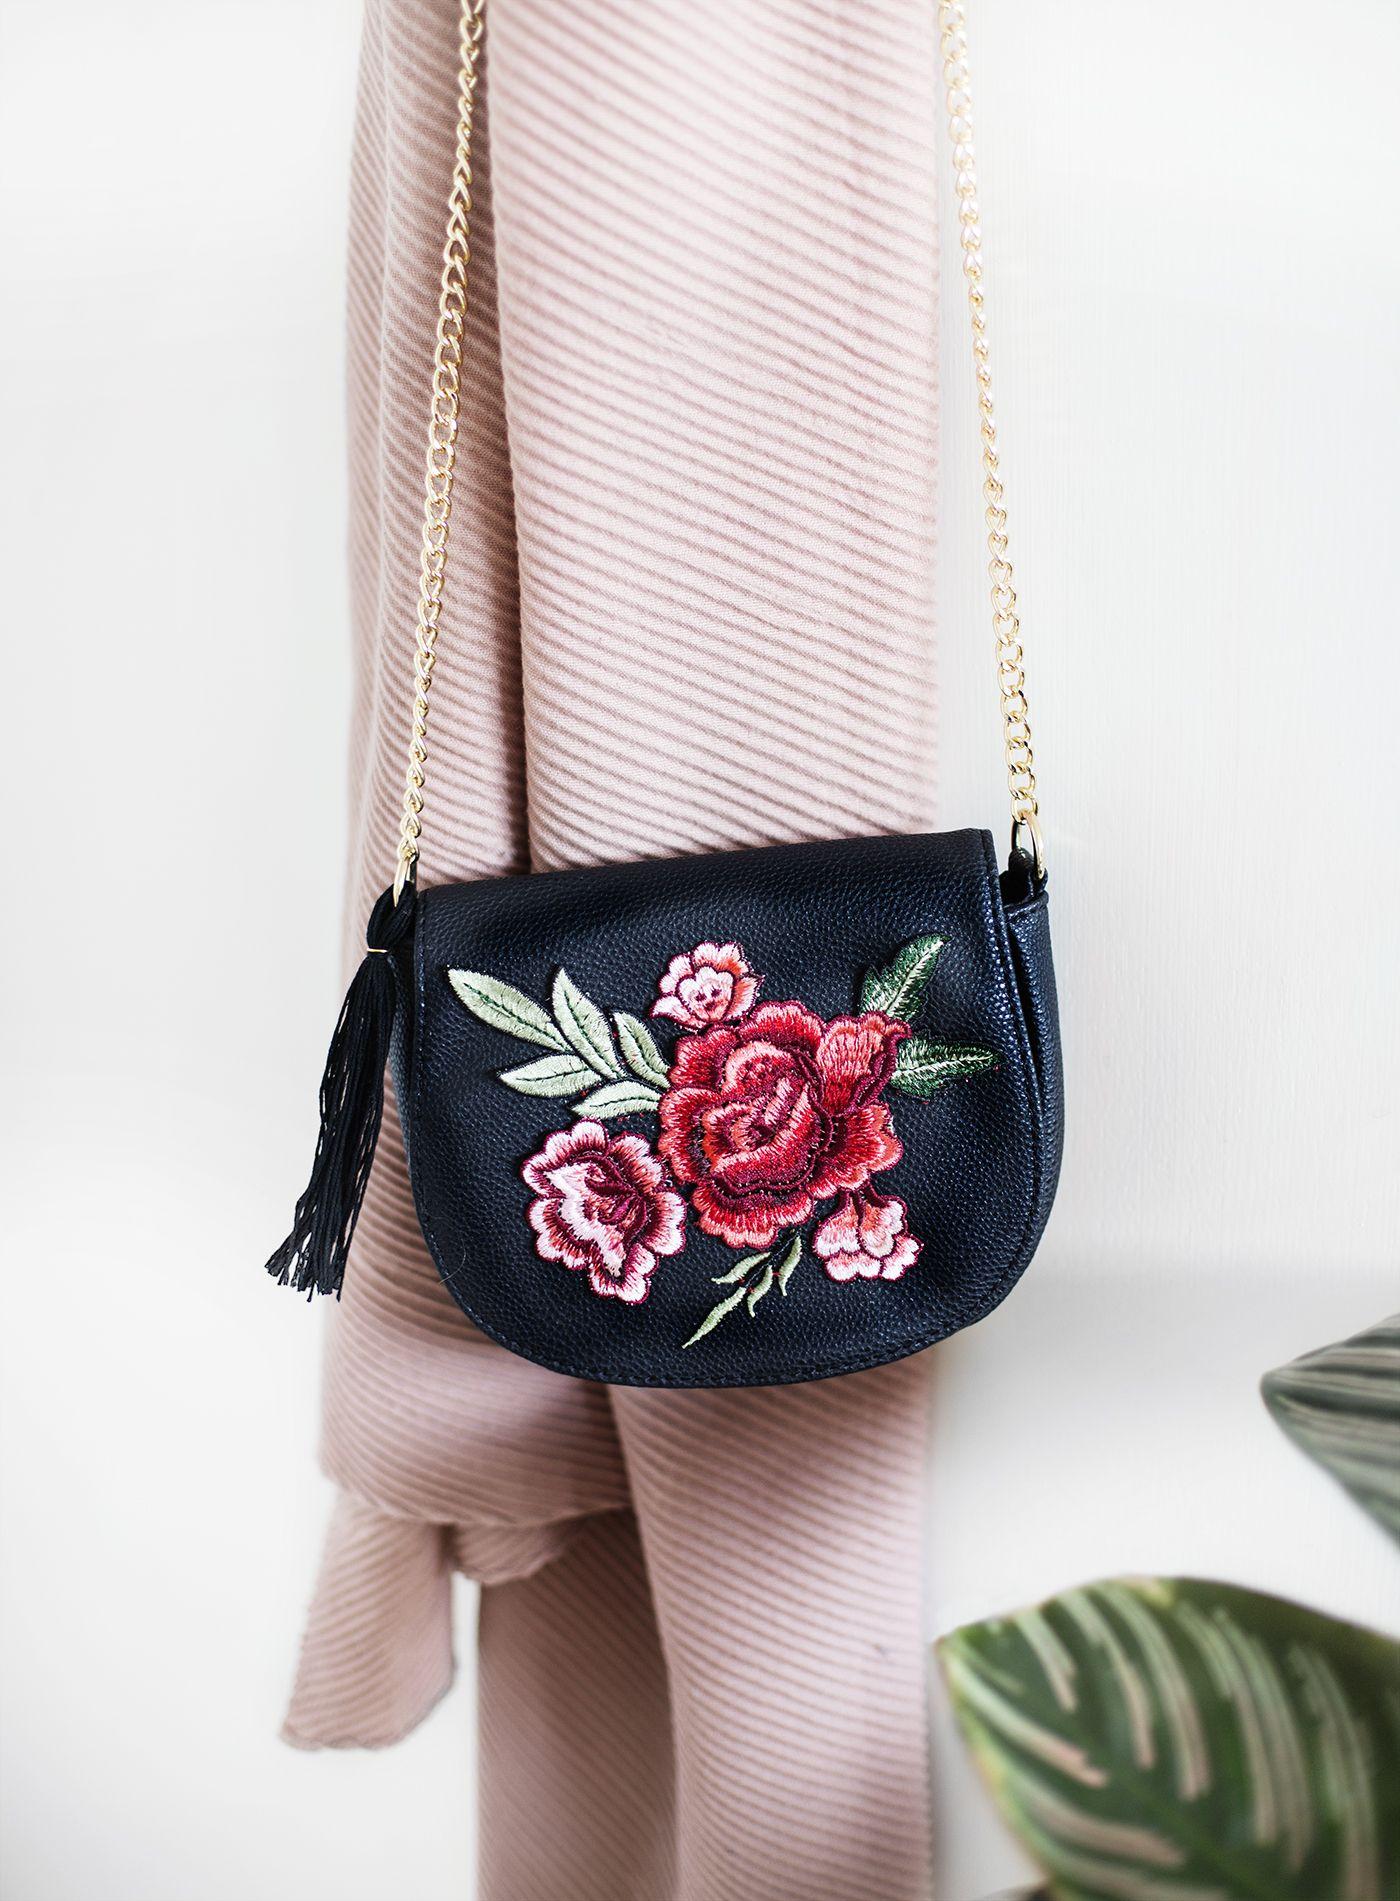 diy: 'no sew' embroidered tassel bag | craft & diy | pinterest